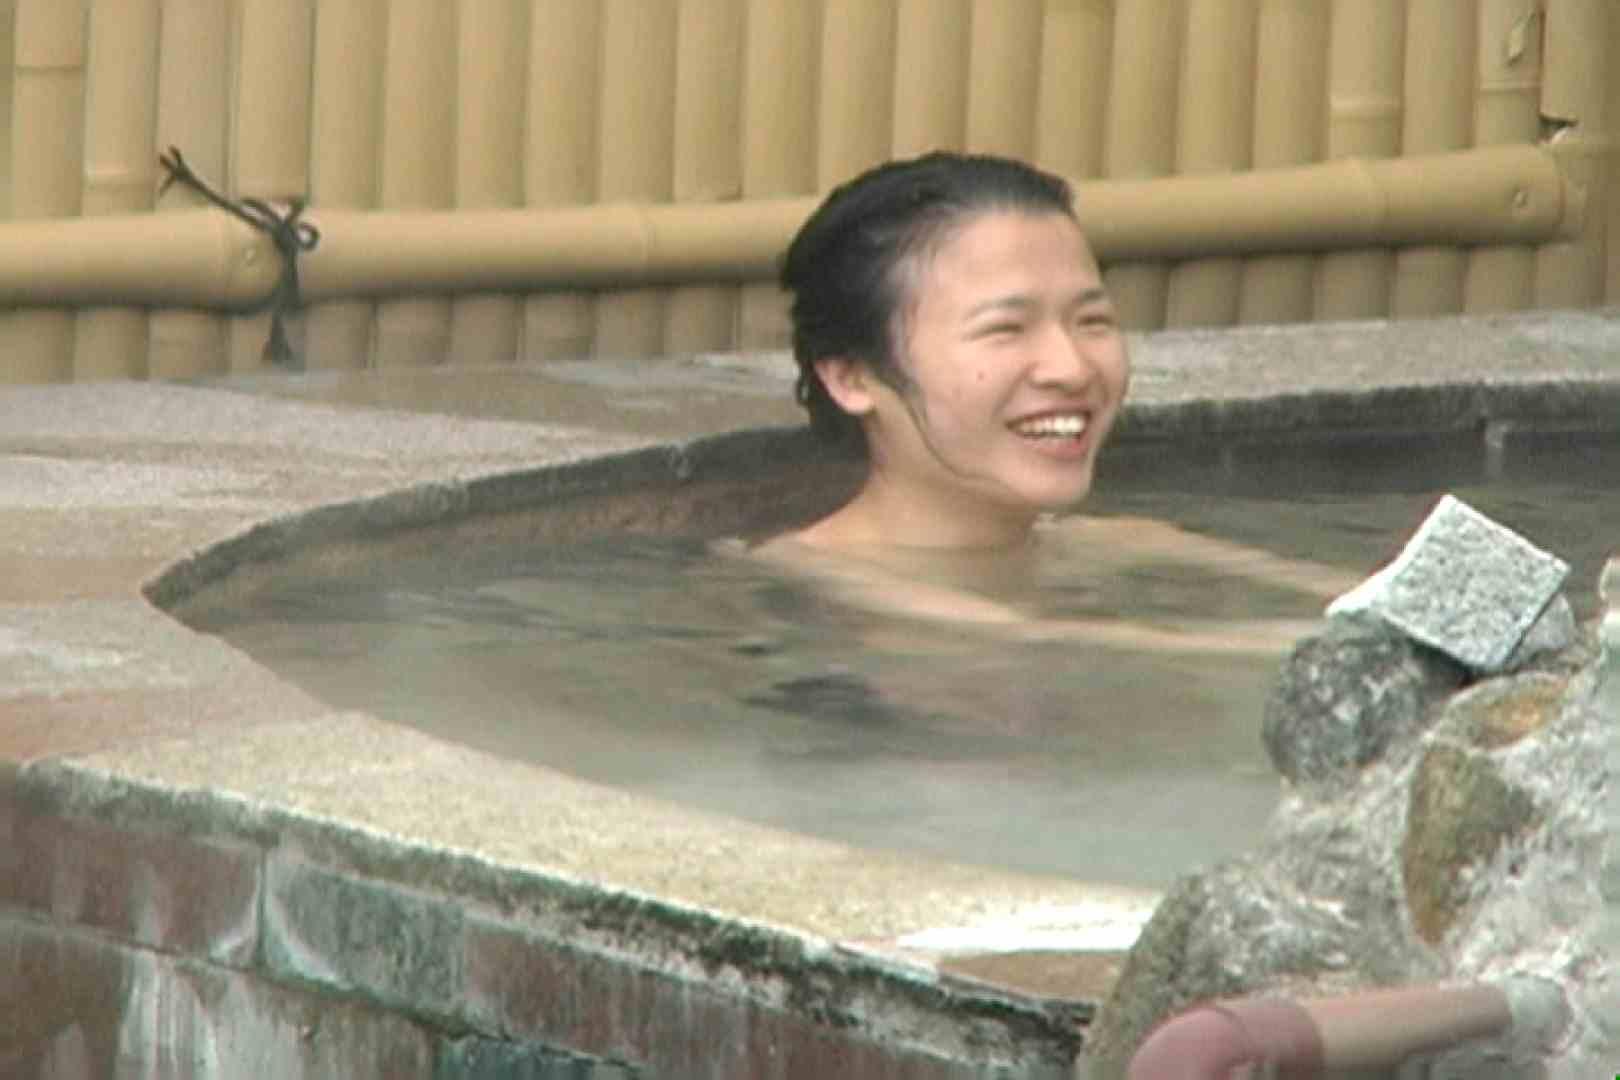 Aquaな露天風呂Vol.647 OLセックス 盗撮戯れ無修正画像 83画像 23